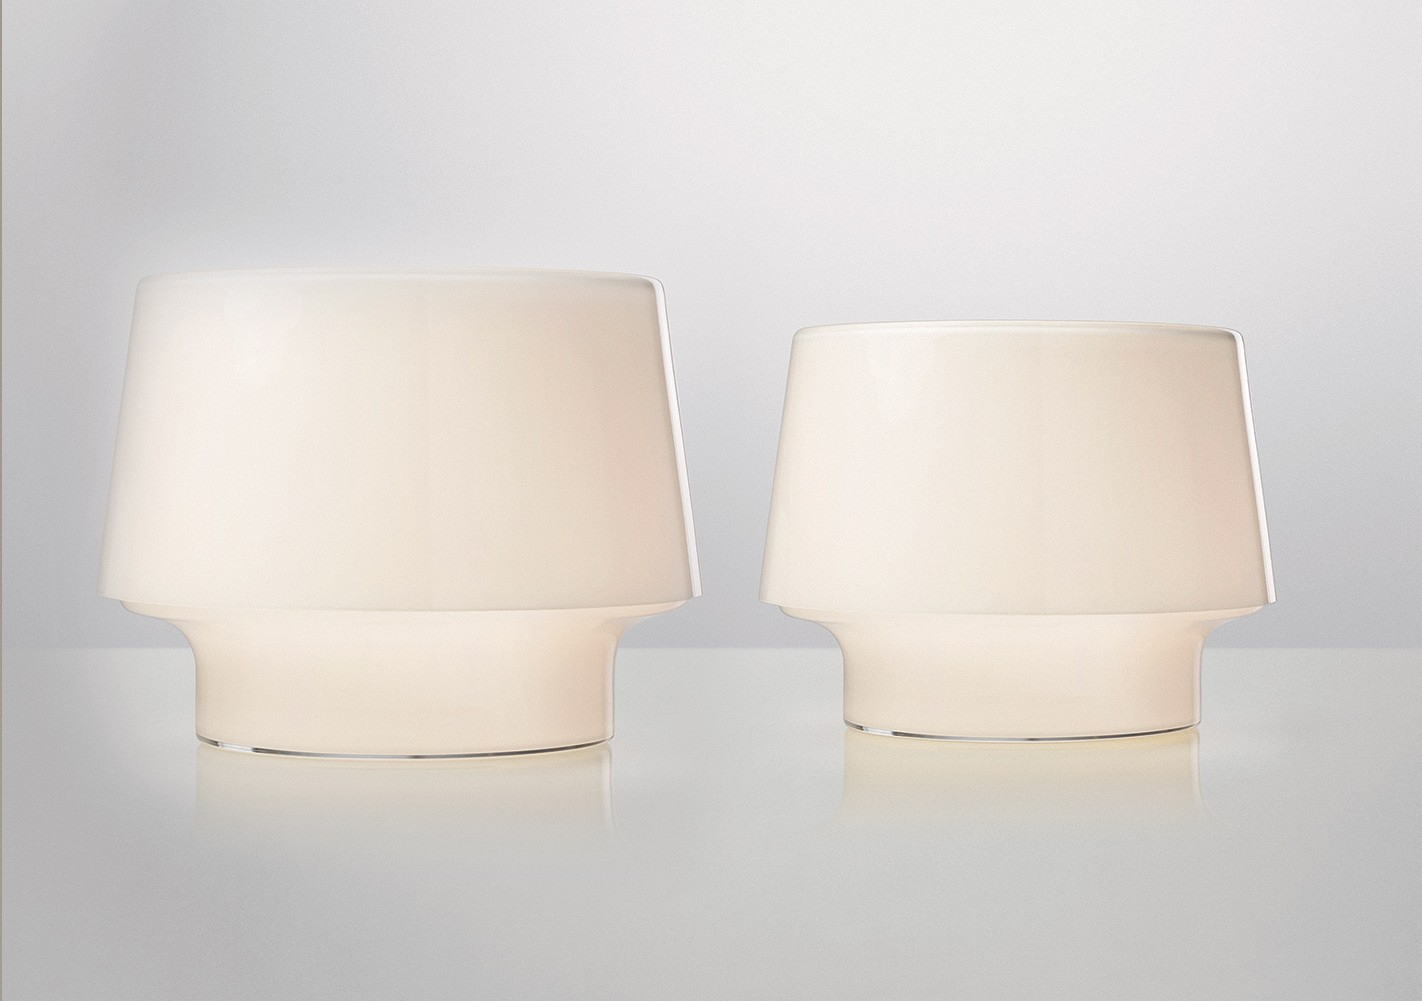 Lampe COSY in White - MUUTO